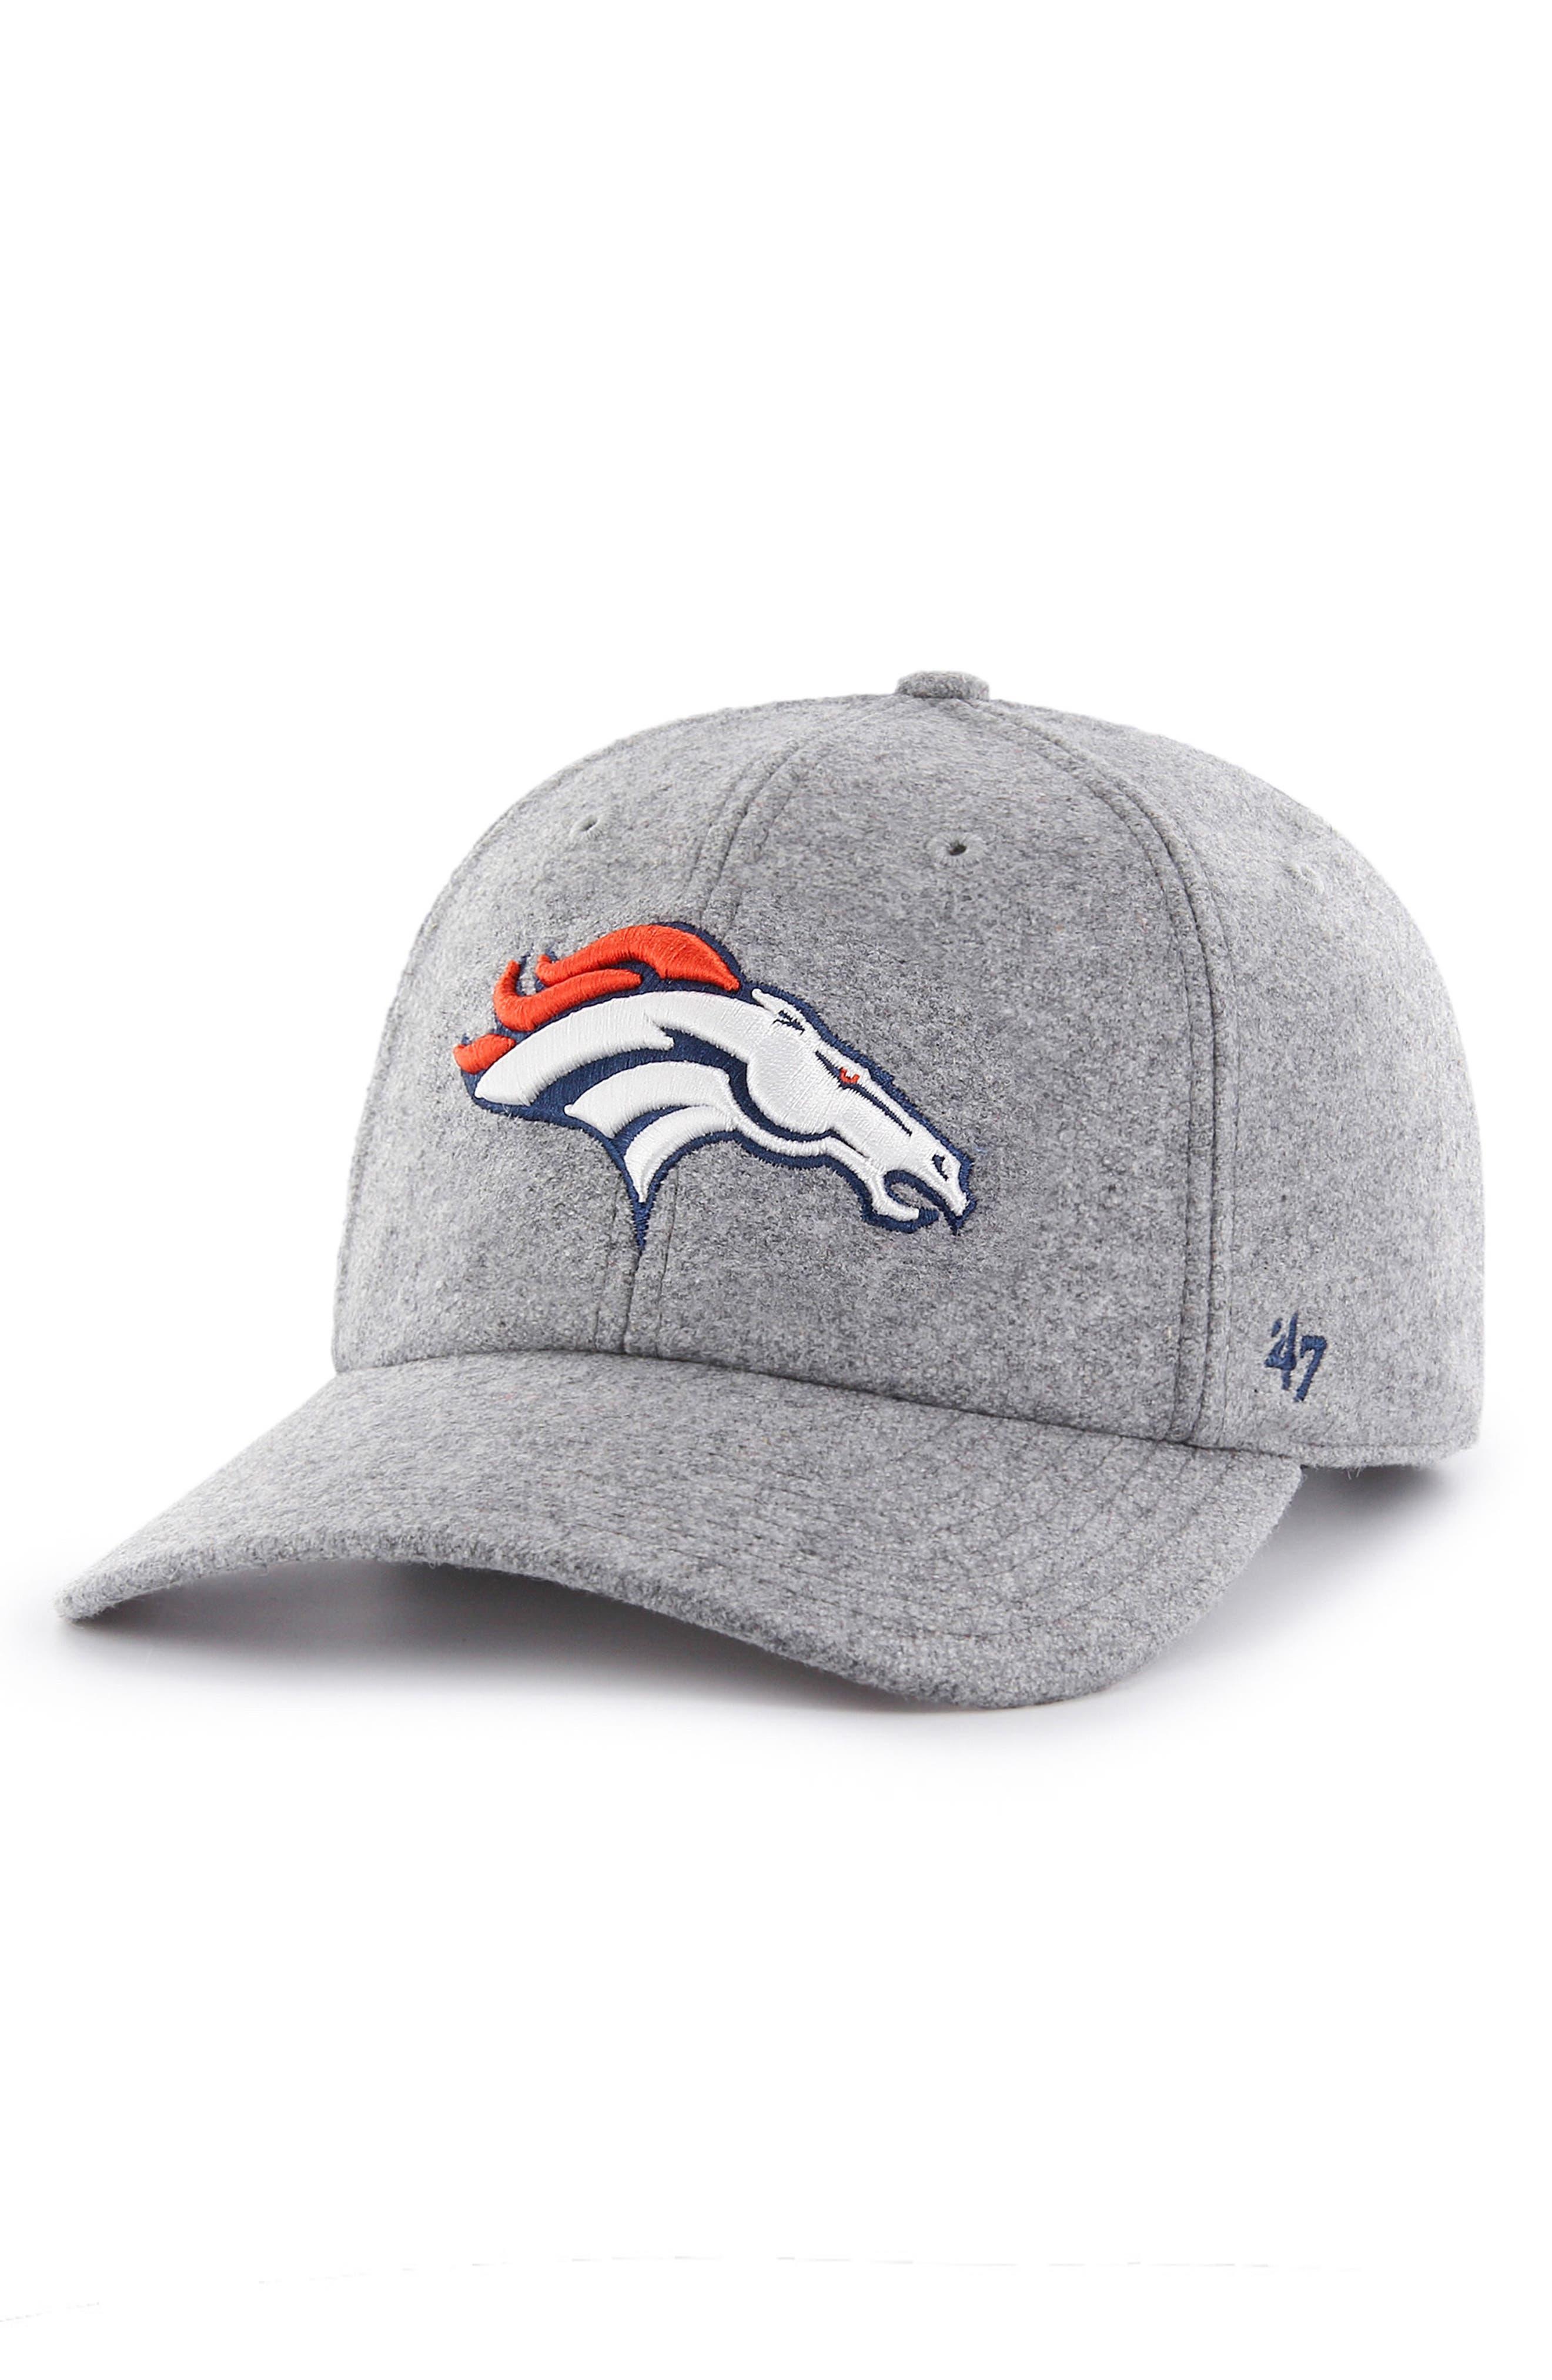 NFL Clean-Up Ball Cap,                         Main,                         color,